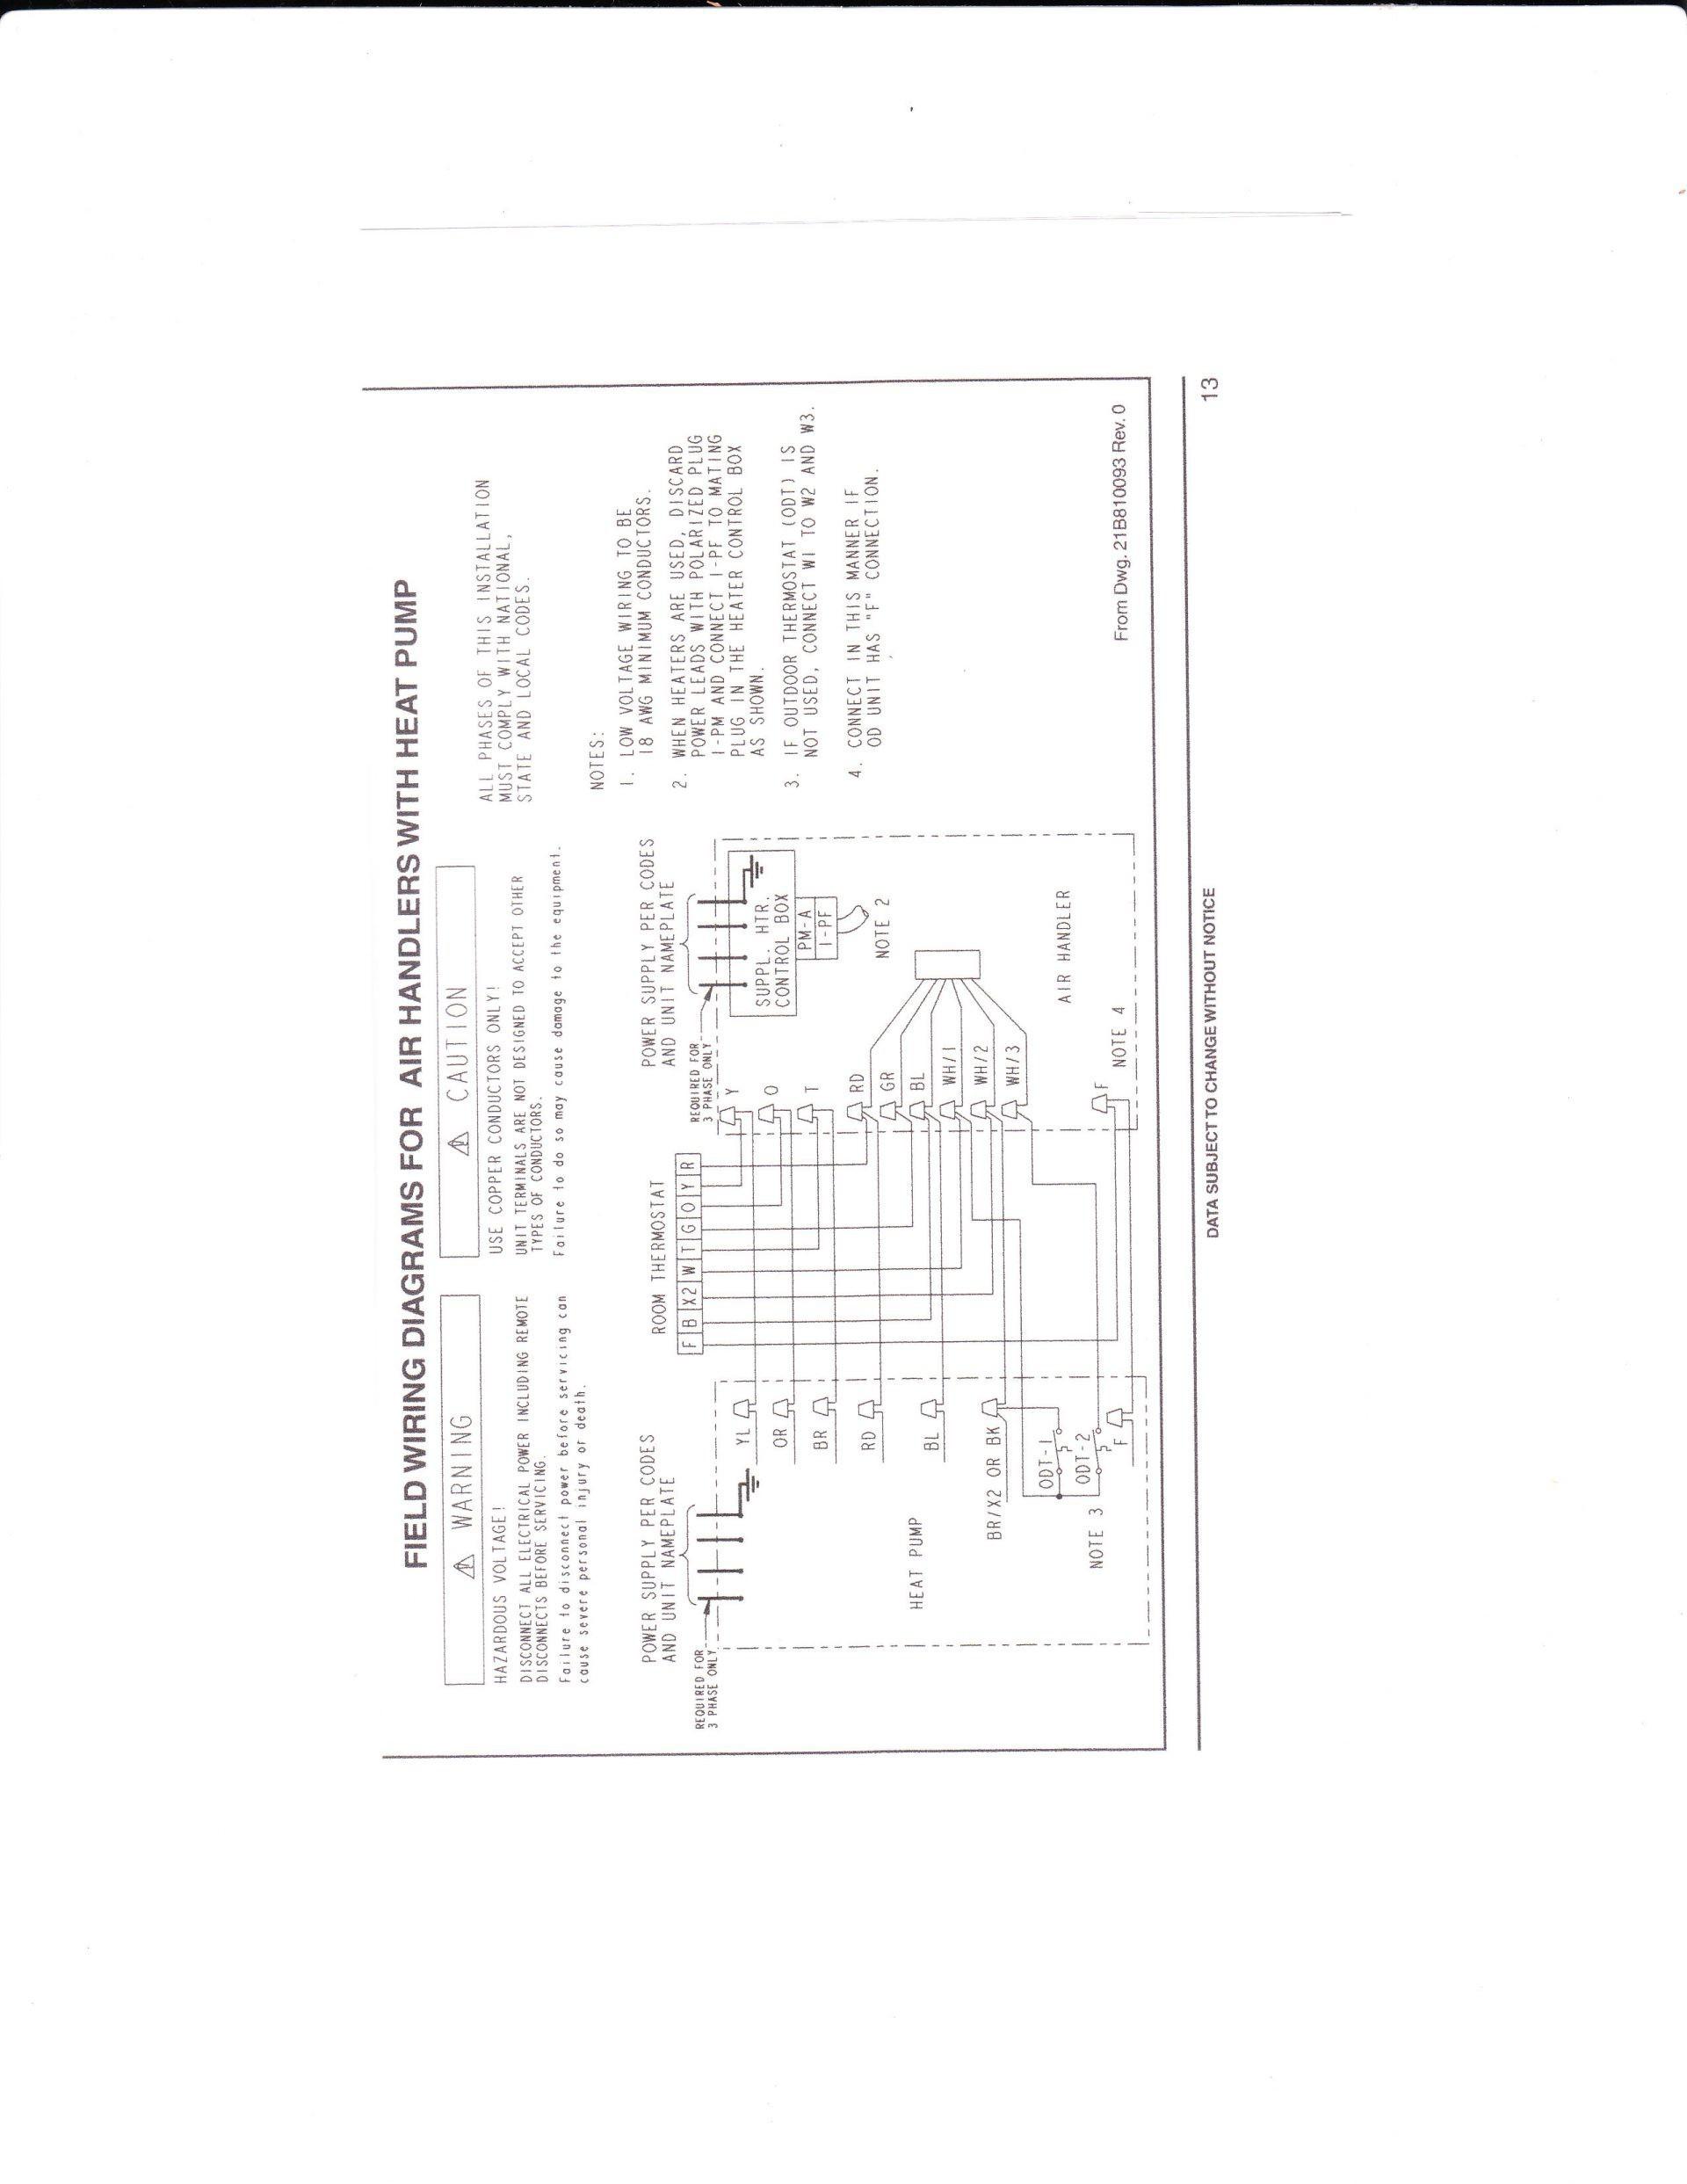 Air Conditioner Wiring Diagram For 1200 Xl - 5.2.kachelofenmann.de on heating ductwork diagram, heating ventilation diagram, dishwasher plumbing diagram, heating service, heating repair, heating cooling diagram, heating pump diagram, heating tools, heating coil diagram, heating parts diagram,